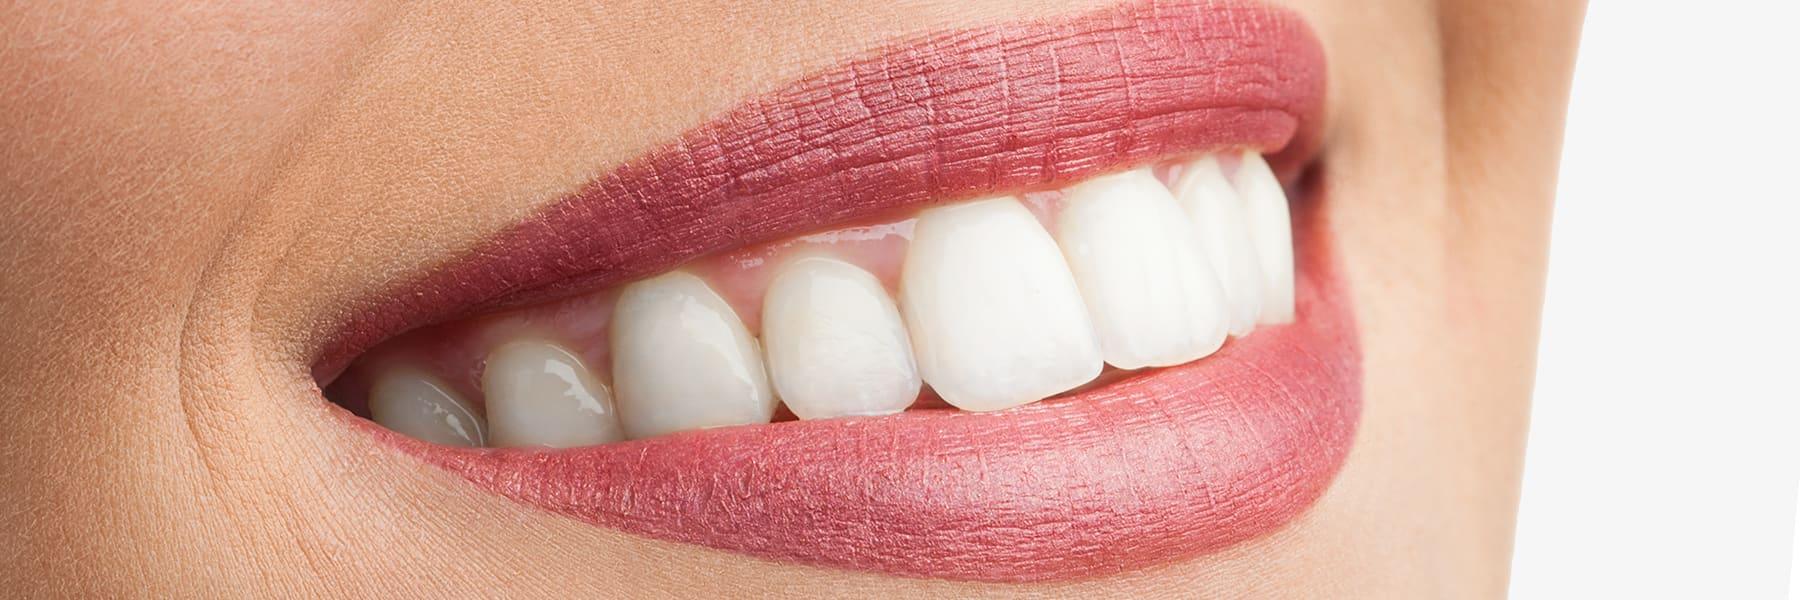 Komplett-unsichtbare-Zahnspange